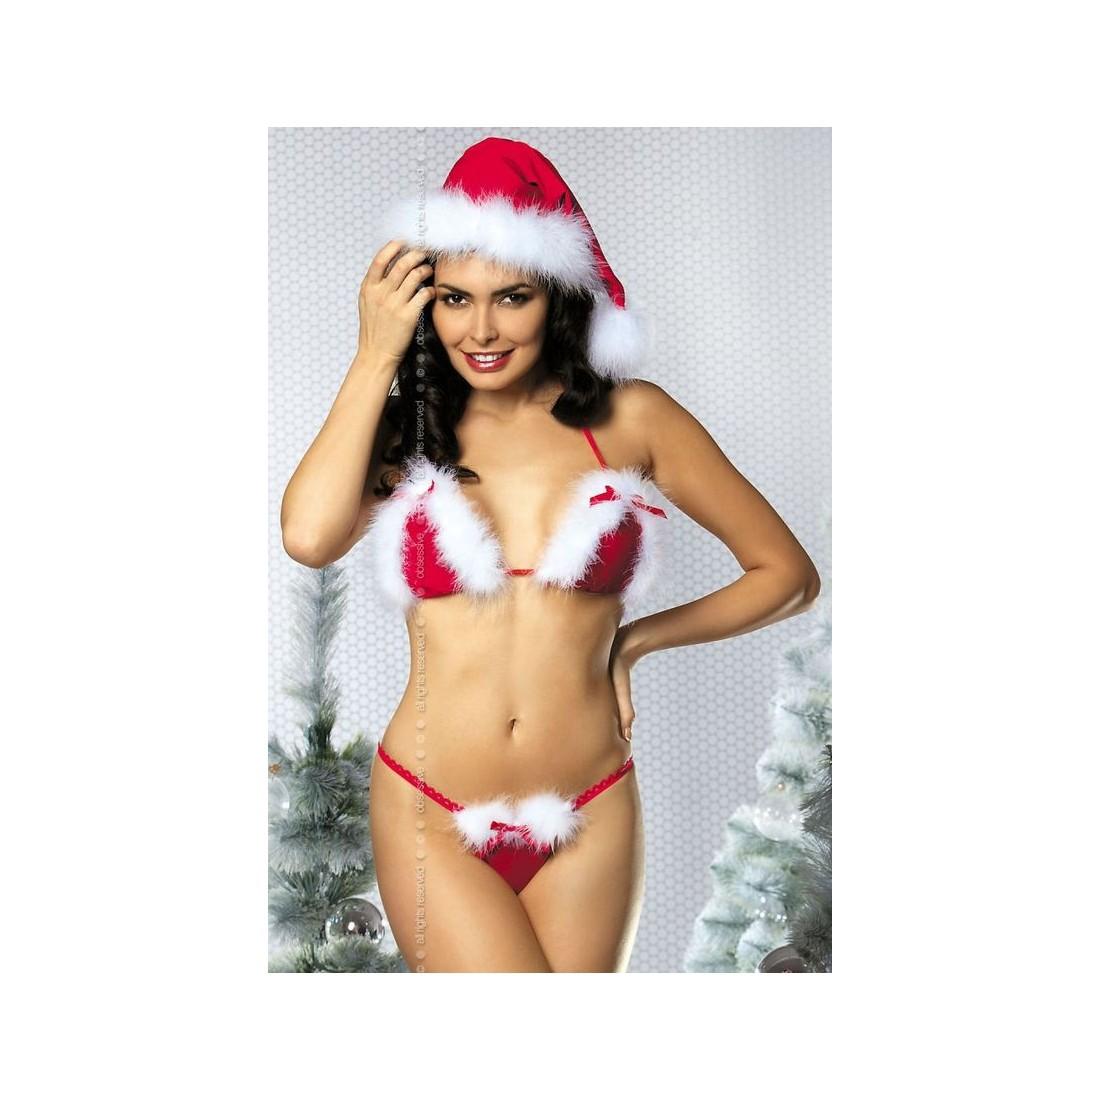 Sexy lingerie women three point bikini gauze christmas girl women underwear lingerie hollow sexy temptat women underwear sexy